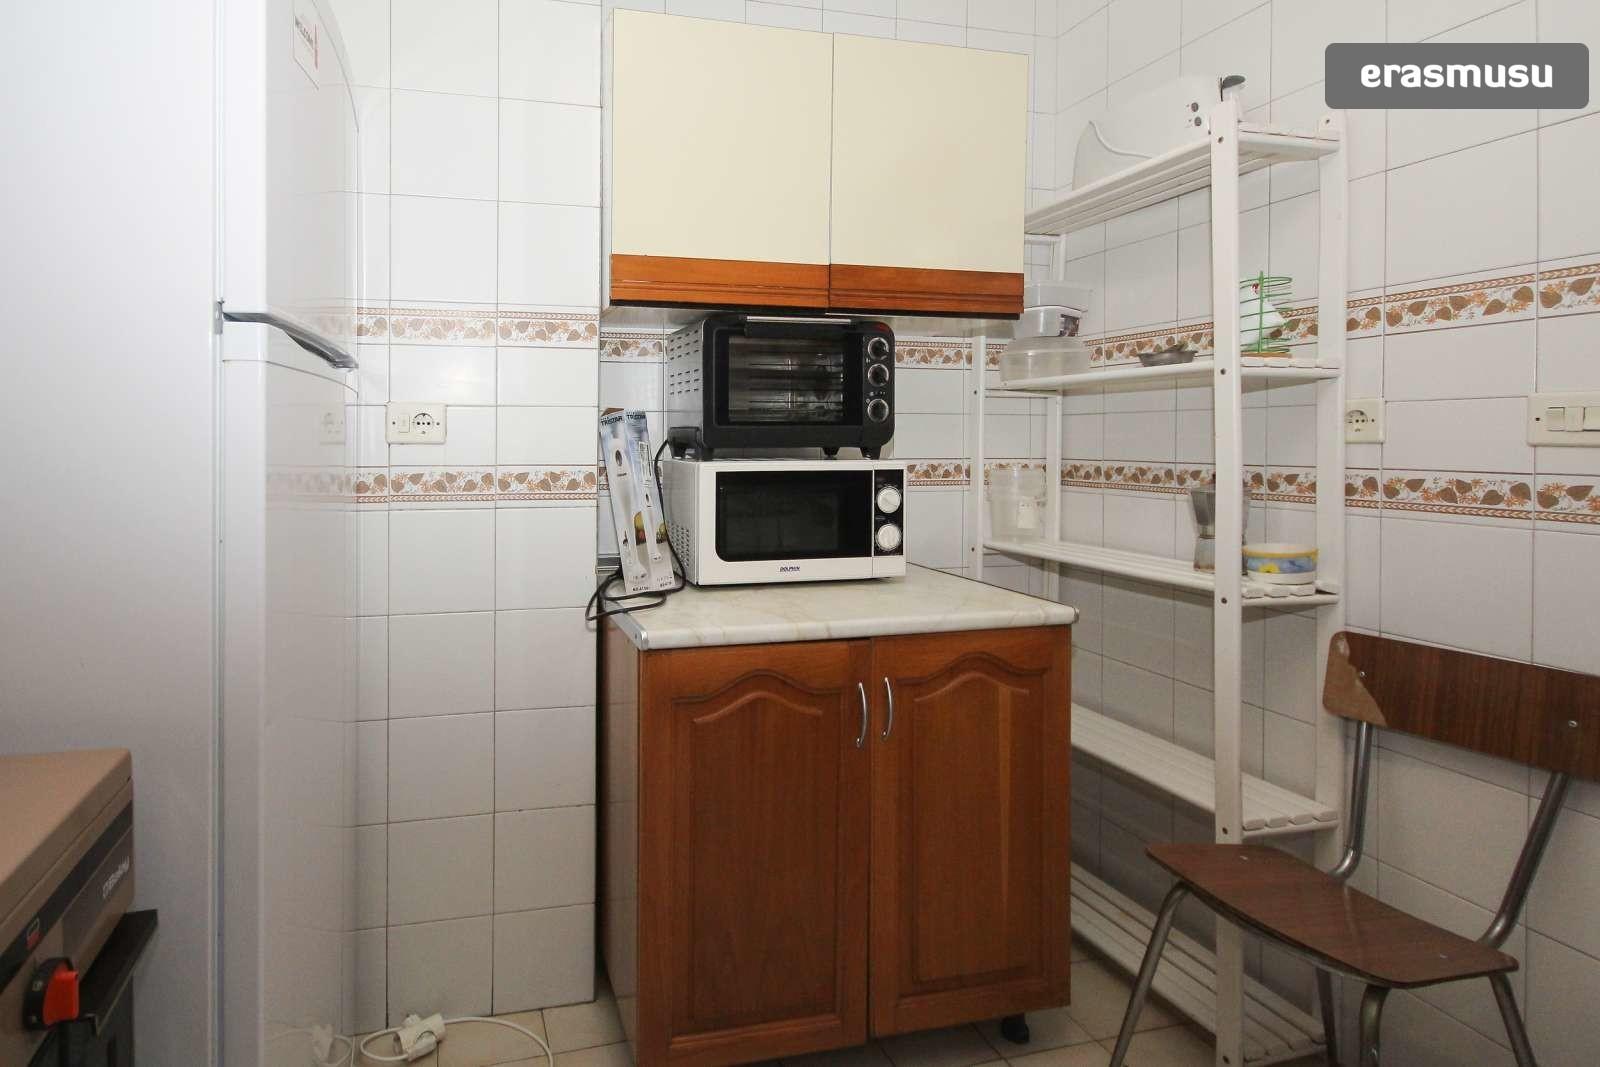 calle-socrates-bdf9b704522a85e850203aaaef0c994d